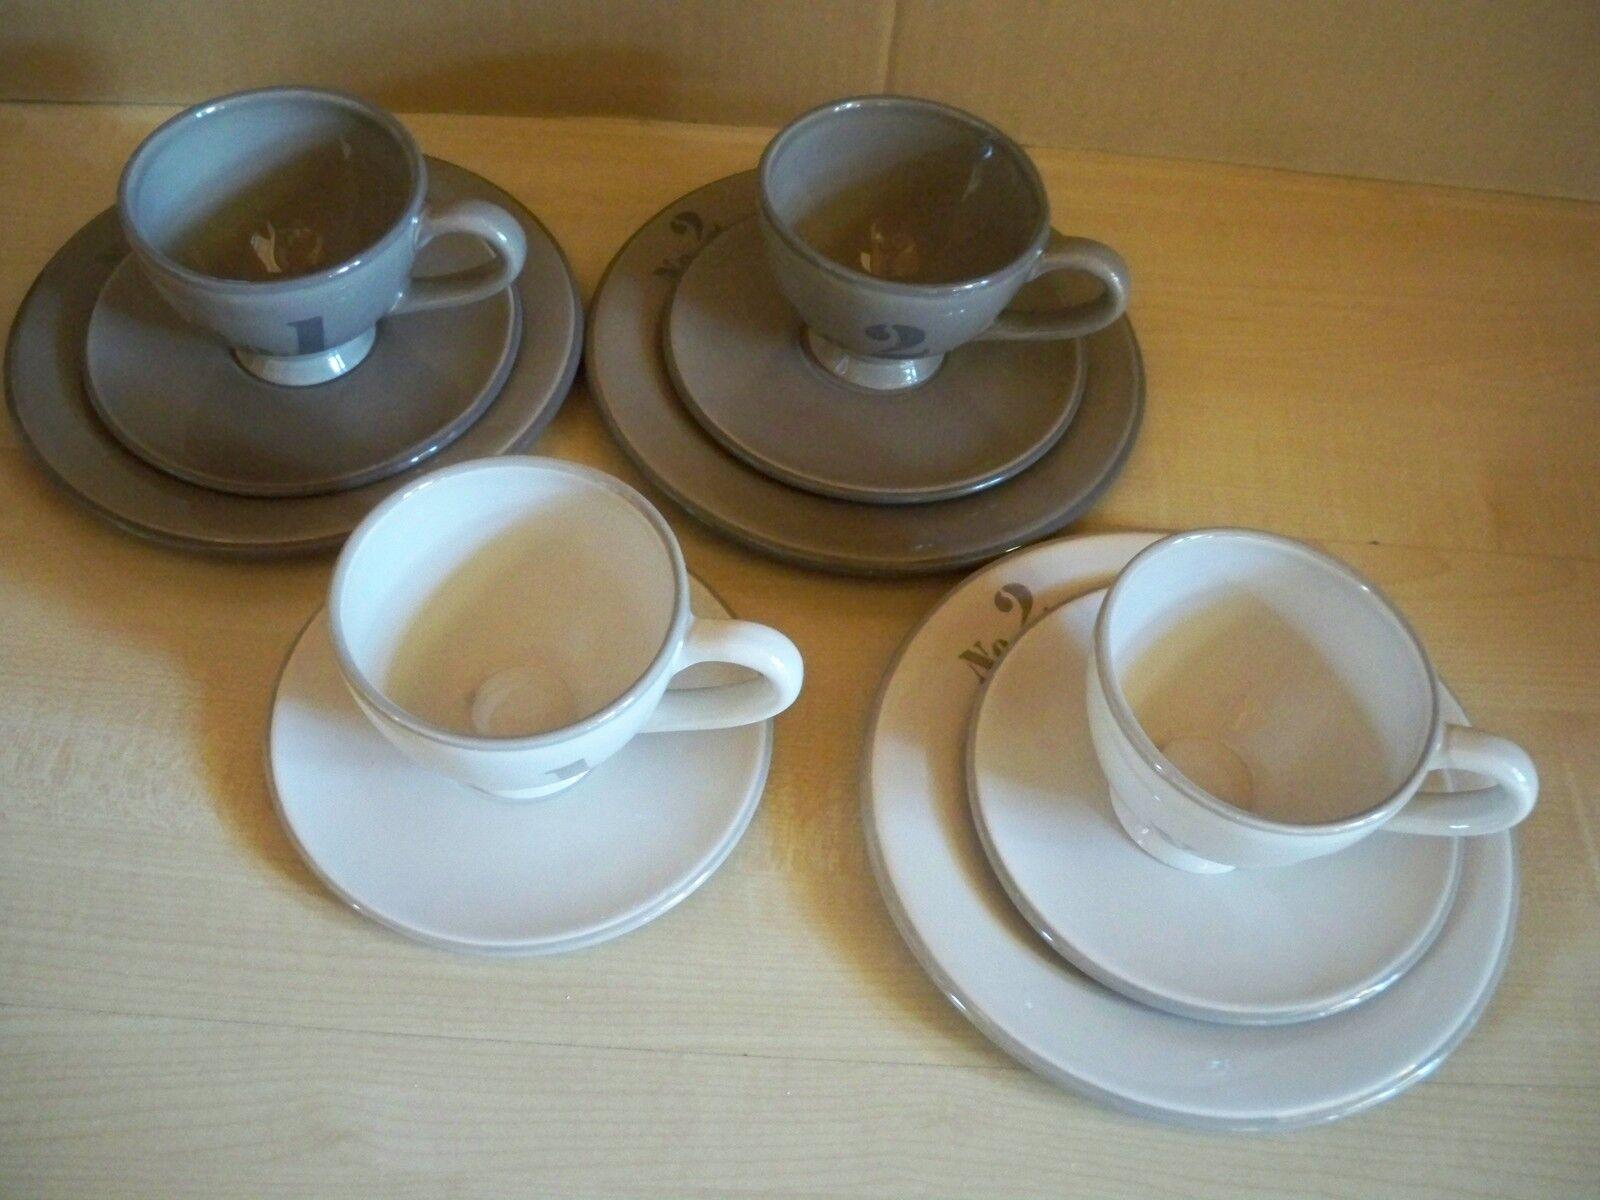 IMPRESSIONEN- Porzellan- Kaffeeservice 11 teilig  Numbers     | Economy